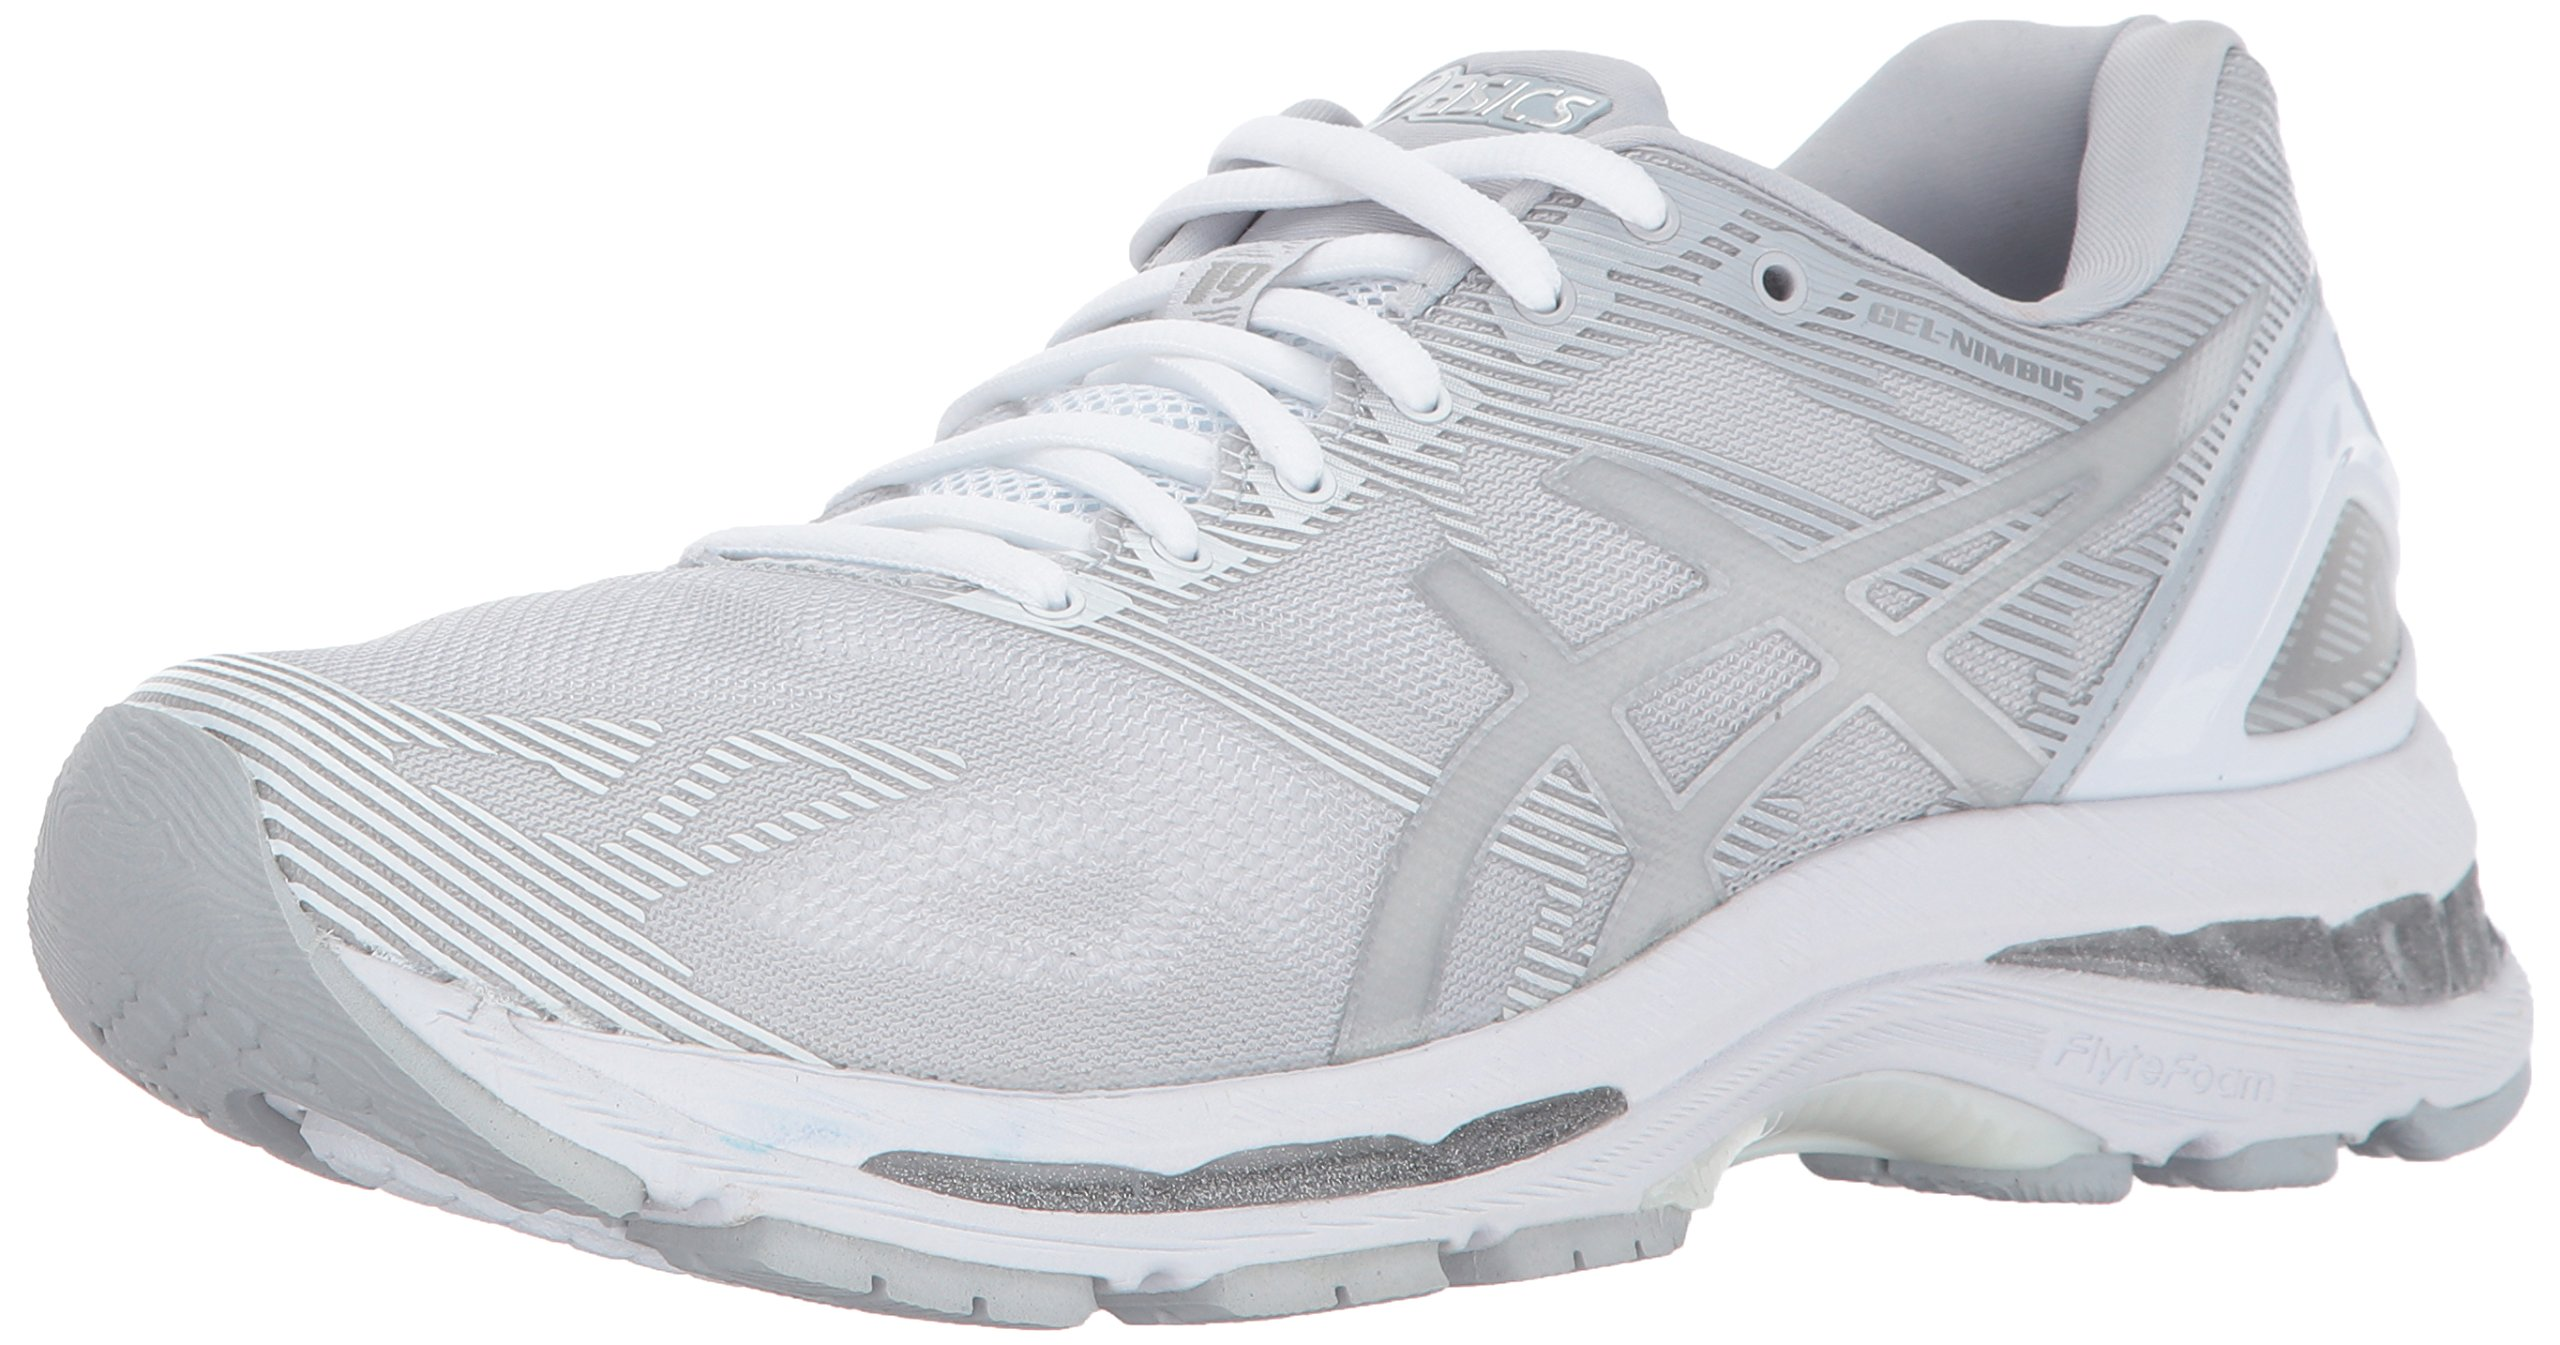 watch 5d2af 5592d ASICS Womens Gel-Nimbus 19 Running Shoe, Glacier Grey/Silver/White, 8.5  Medium US